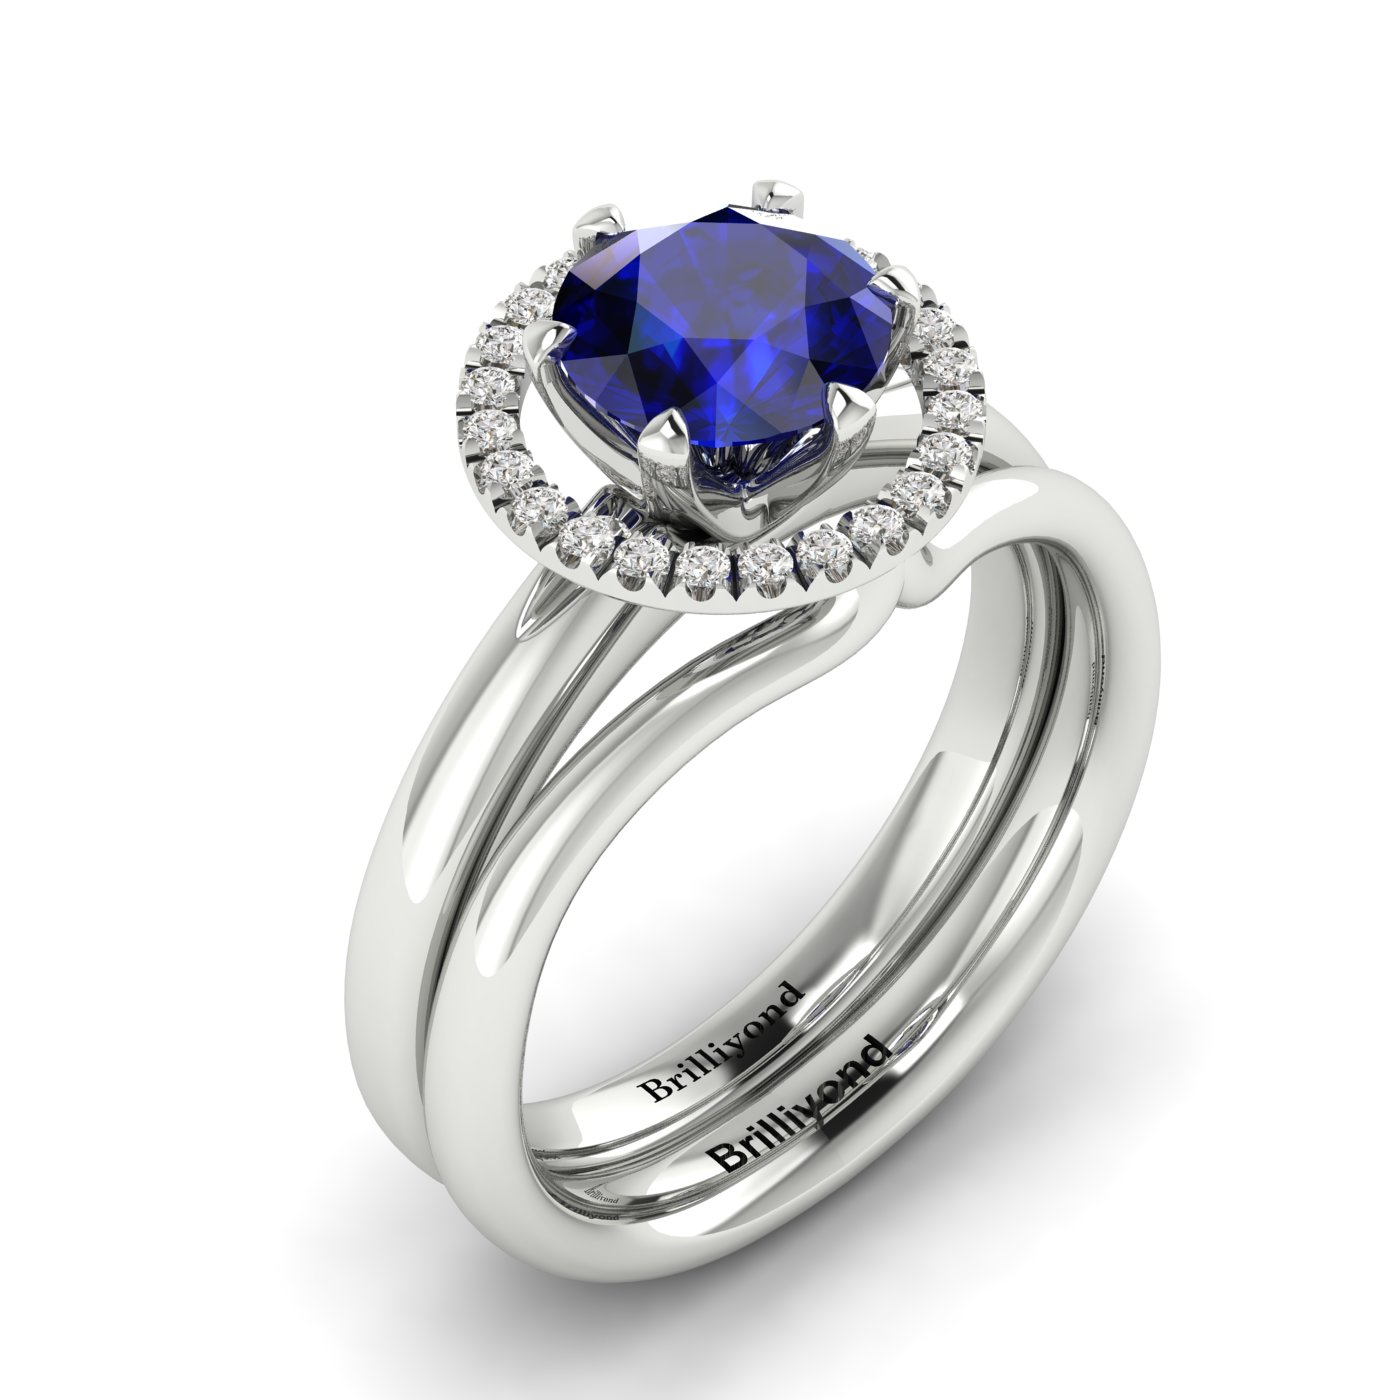 Diamond Halo Ring Guard Enhancer Byond_image1